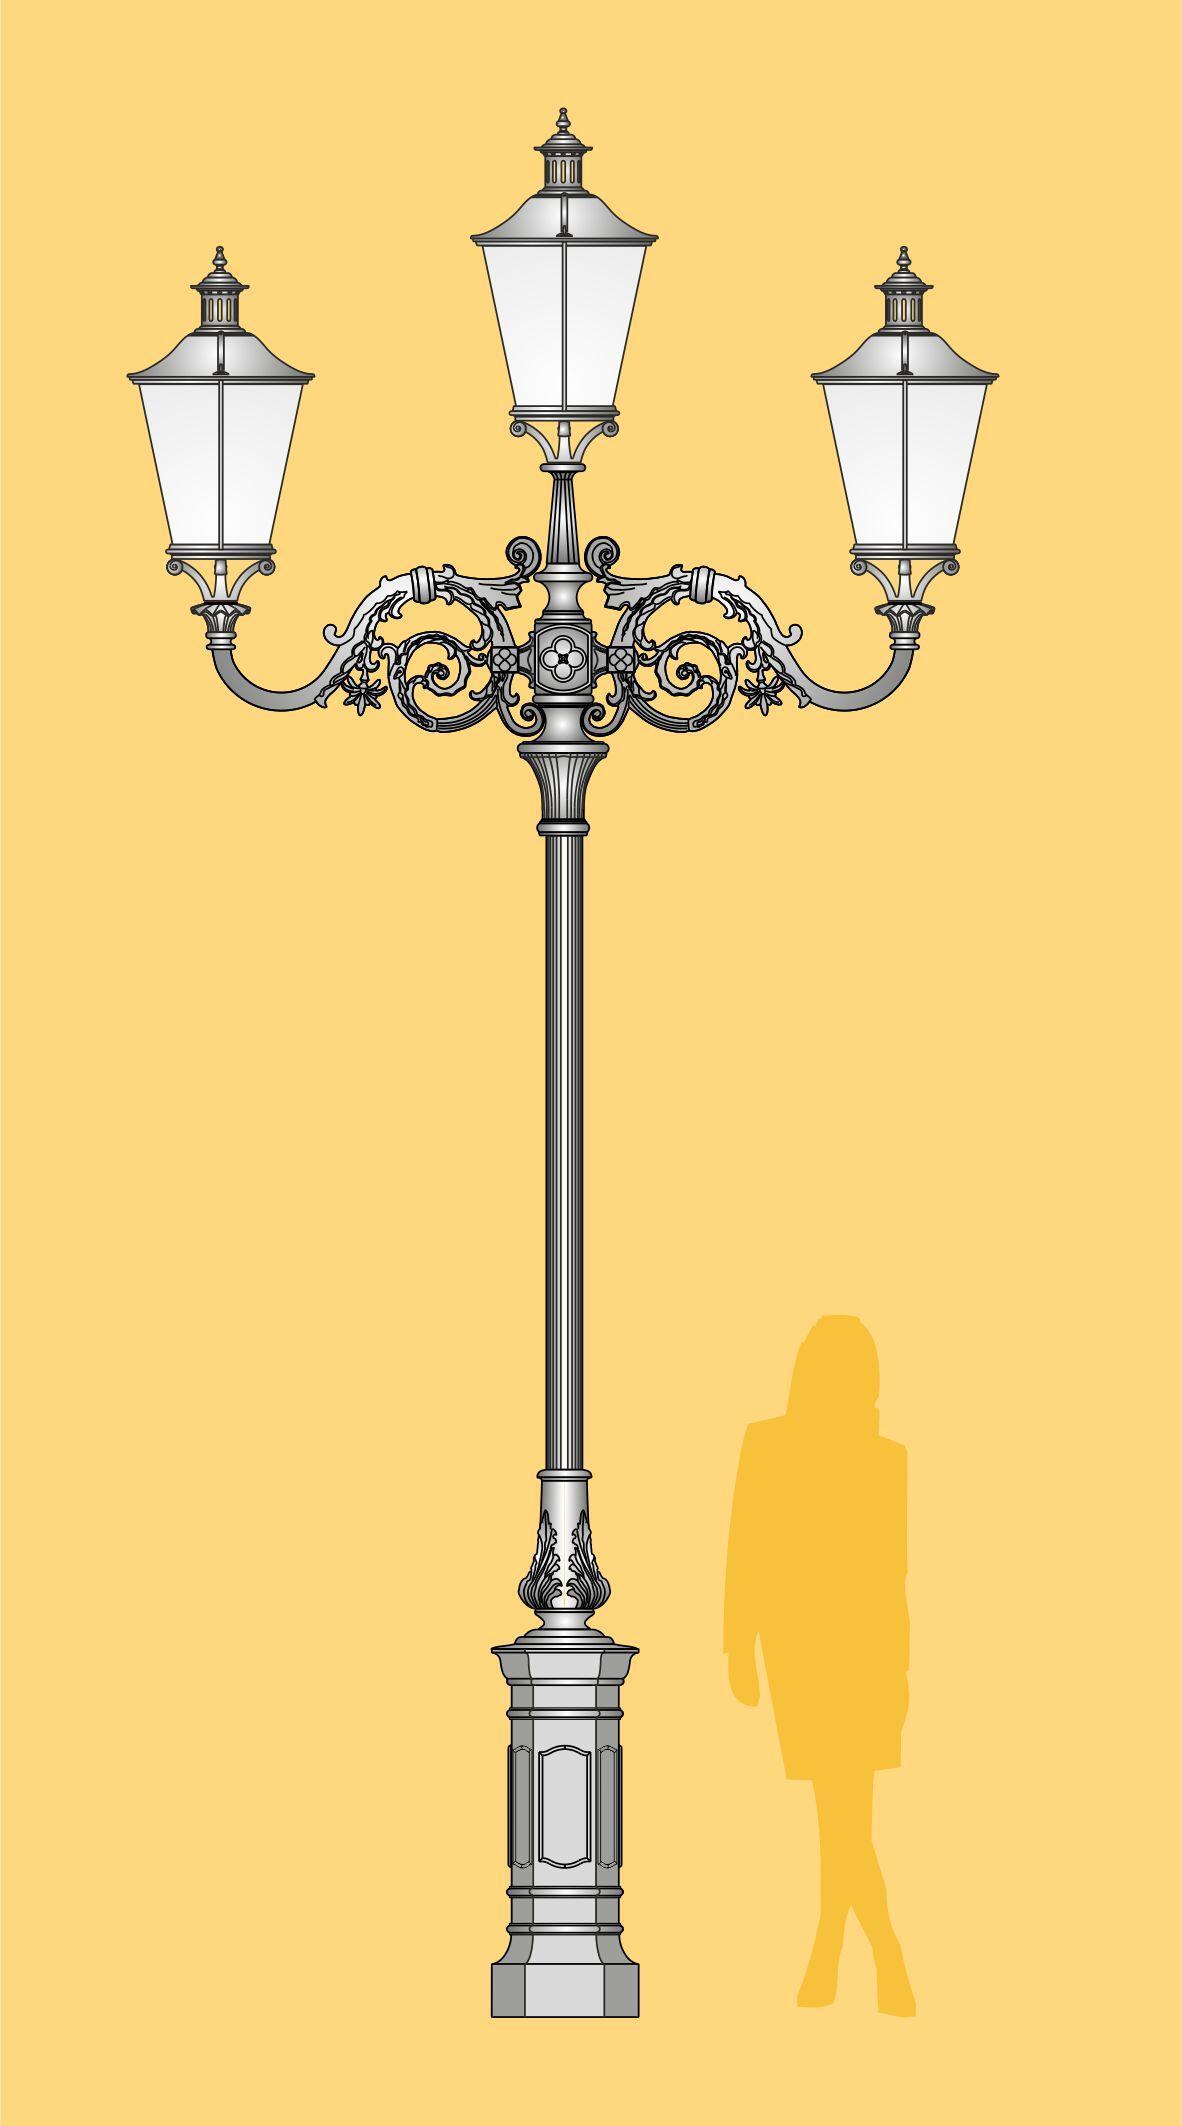 latarnia stylowa, ekskluzywna latarnia LED, stylowa latarnia uliczna